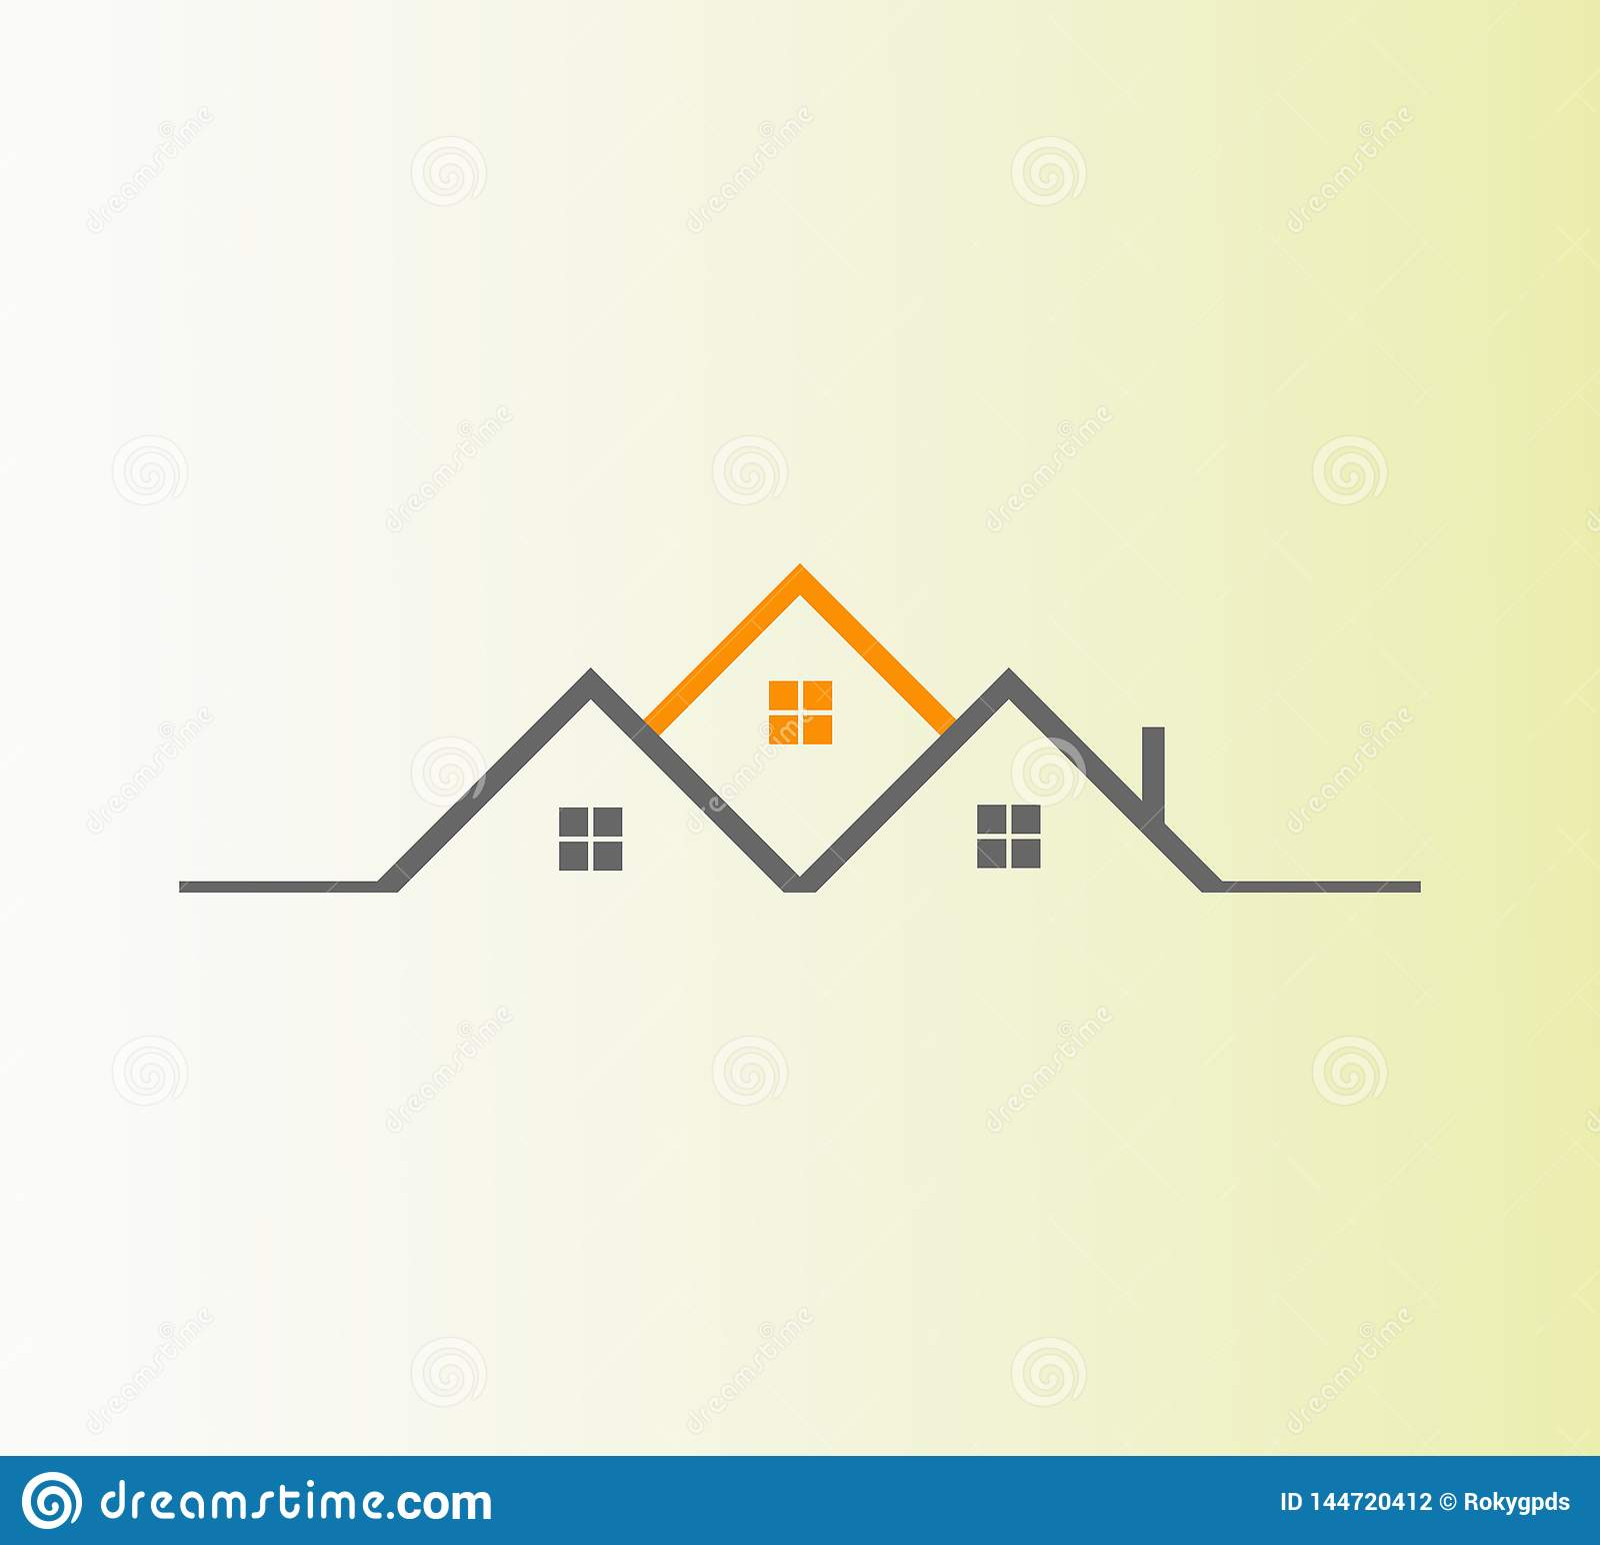 Vector Real Estate Logo Design.Best  abstract real estate icon logo